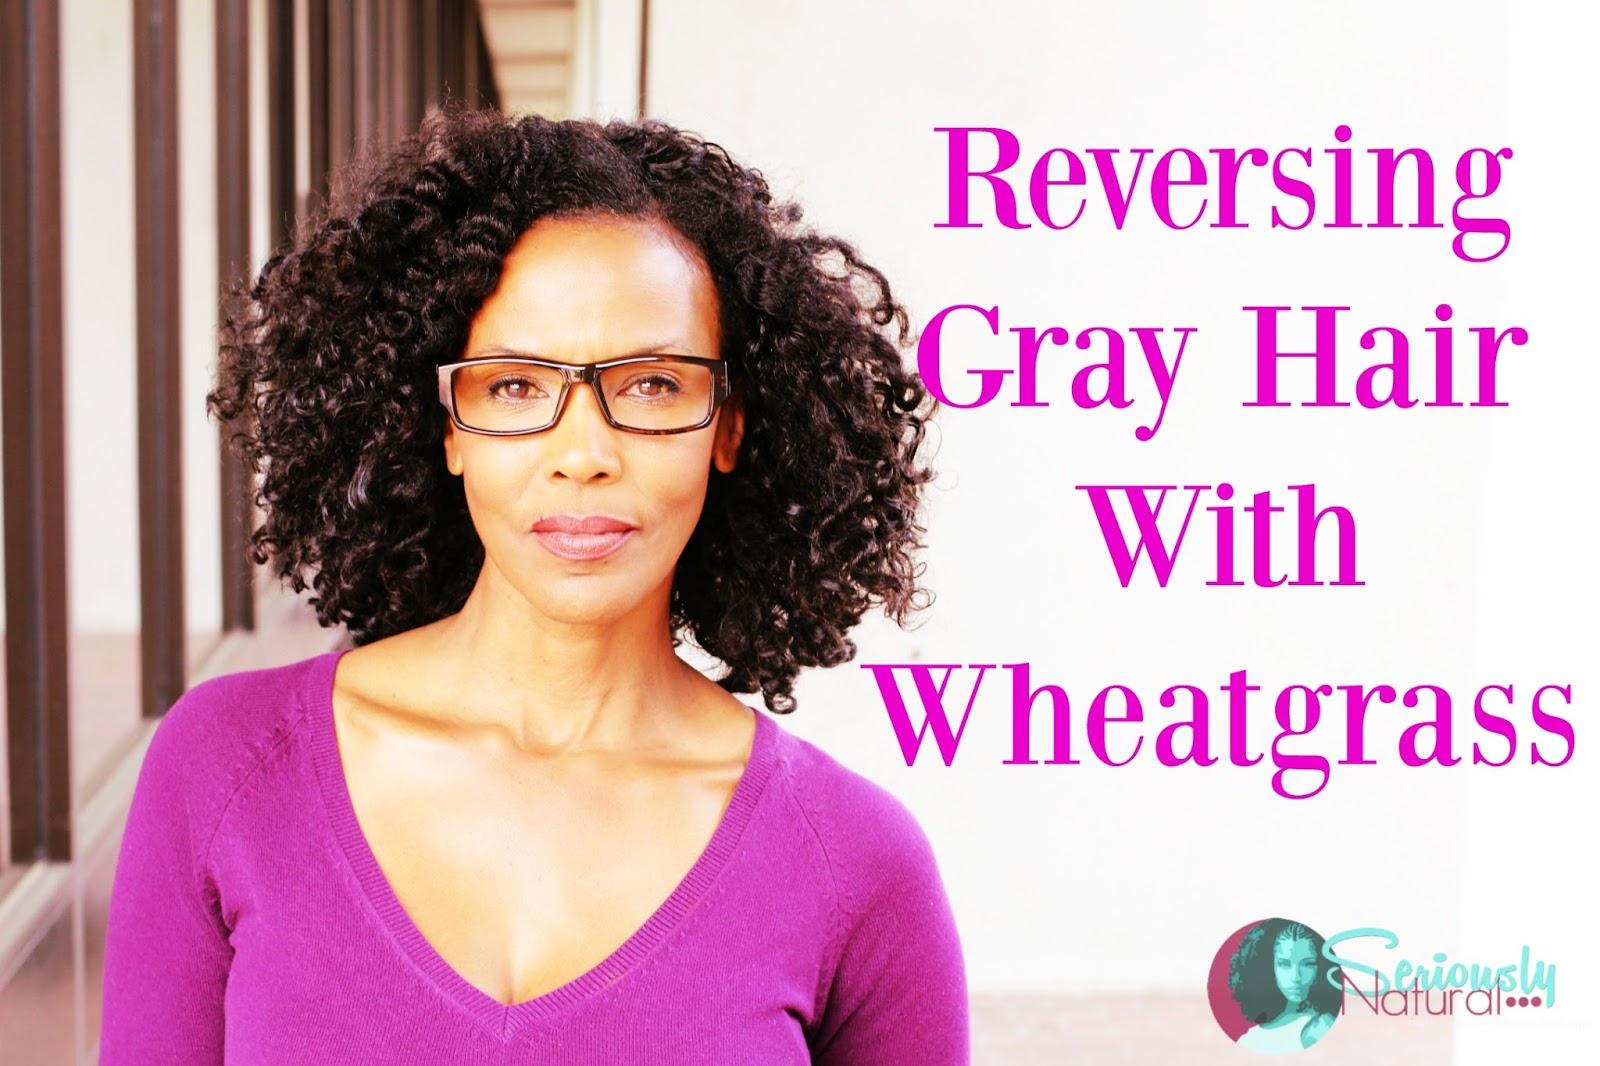 Reversing Gray Hair With Wheatgrass